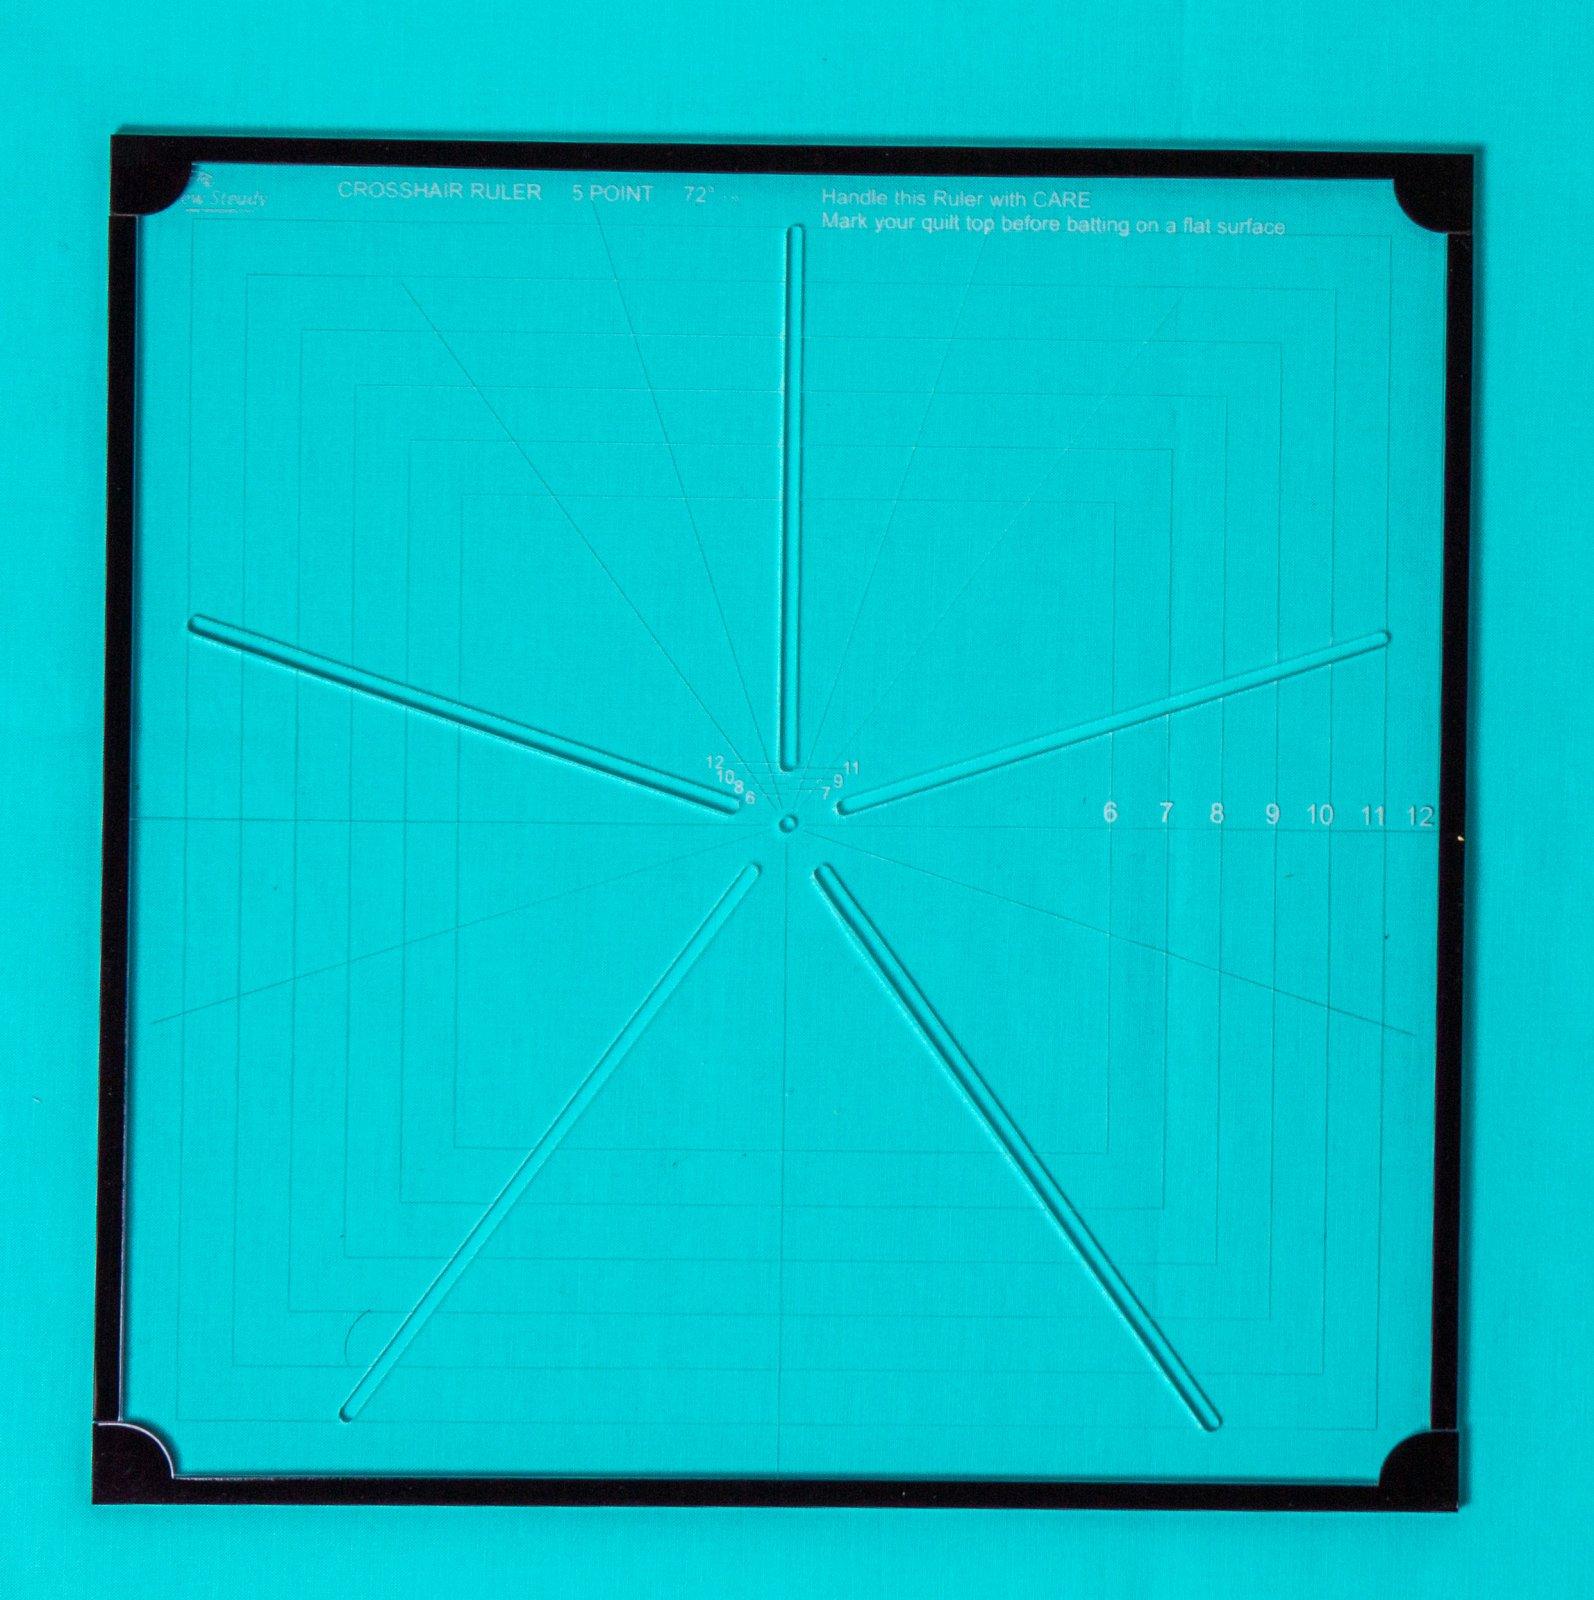 Westalee Crosshair Square CHS5PT-12.5 Template